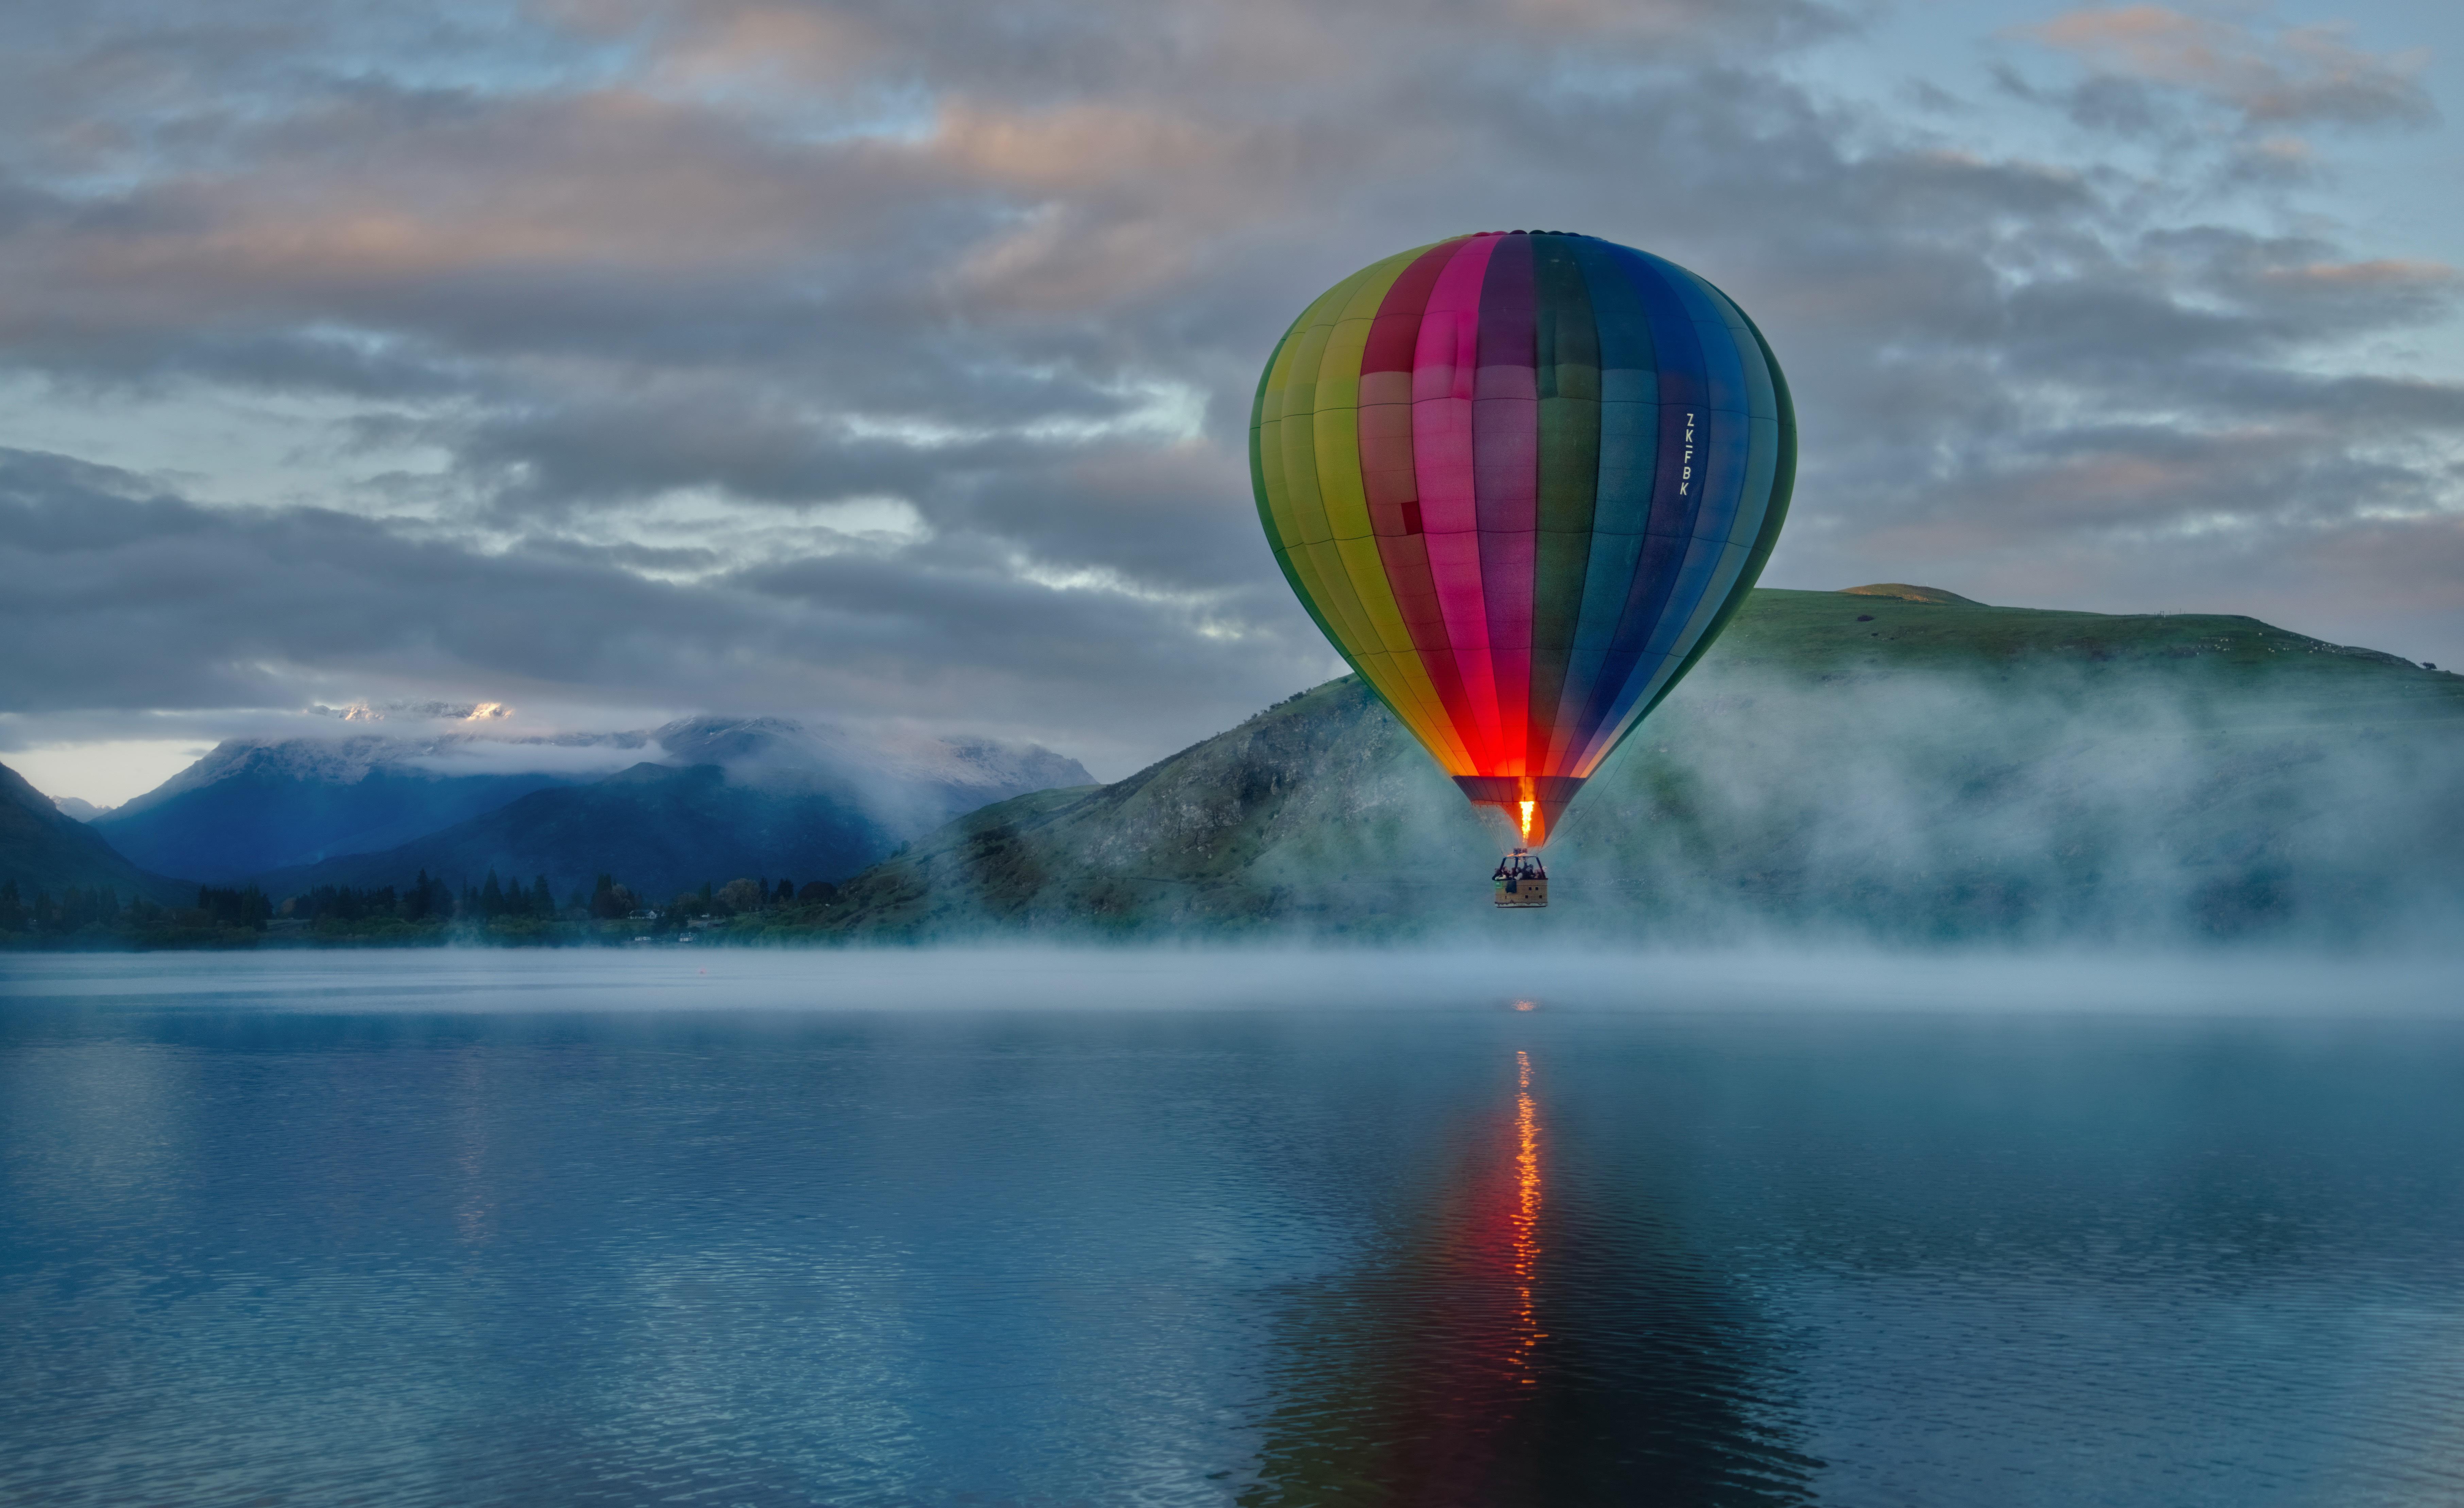 Hot Air Balloon 8k Hd Nature 4k Wallpapers Images